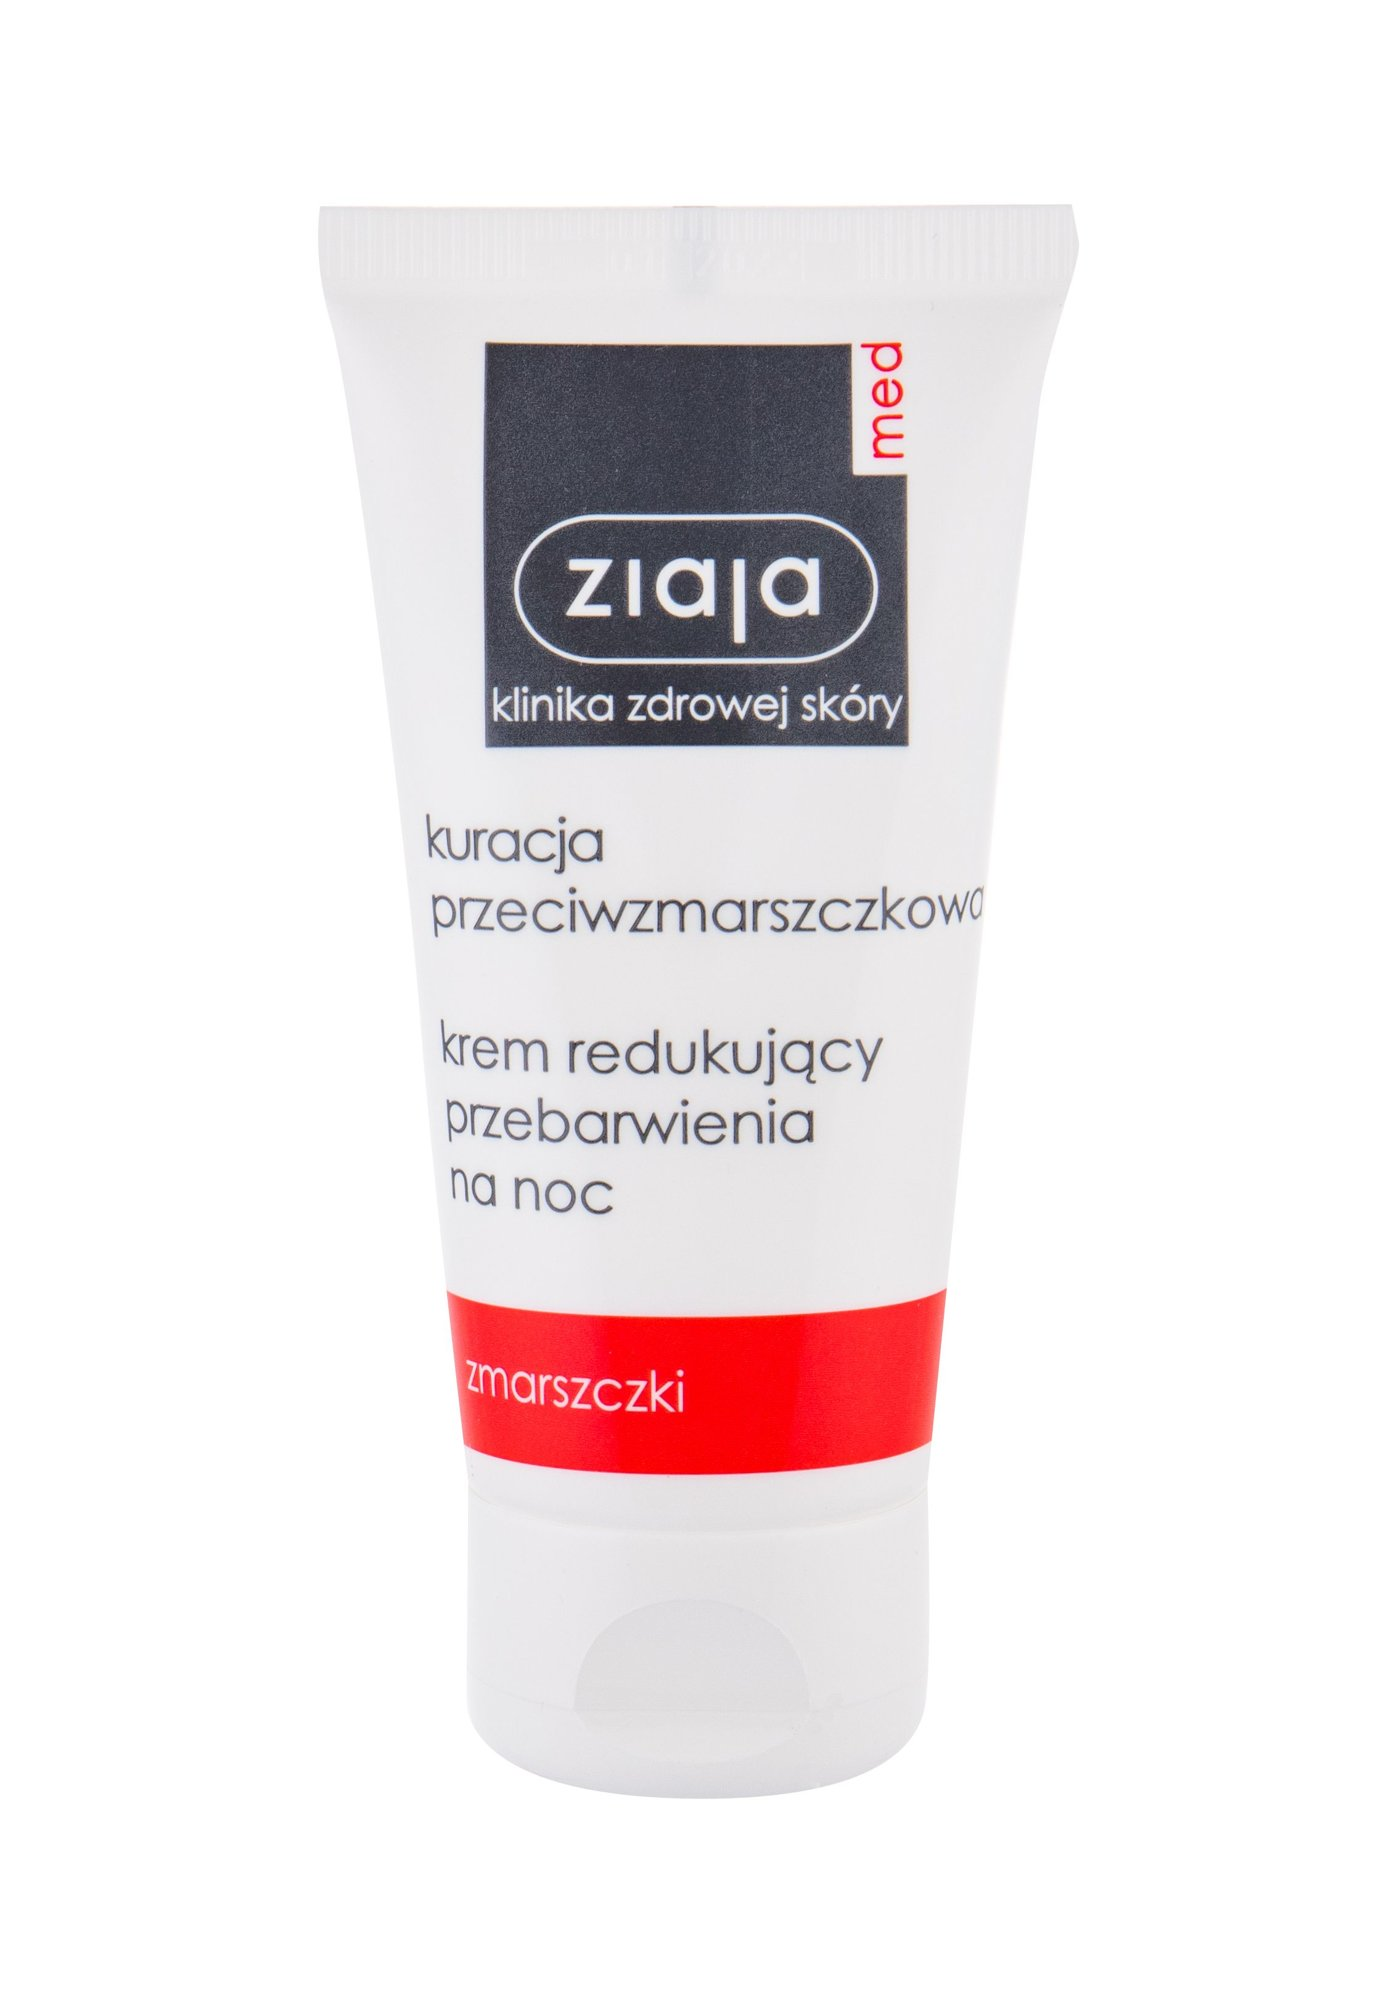 Ziaja Med Anti-Wrinkle Treatment Night Skin Cream 50ml